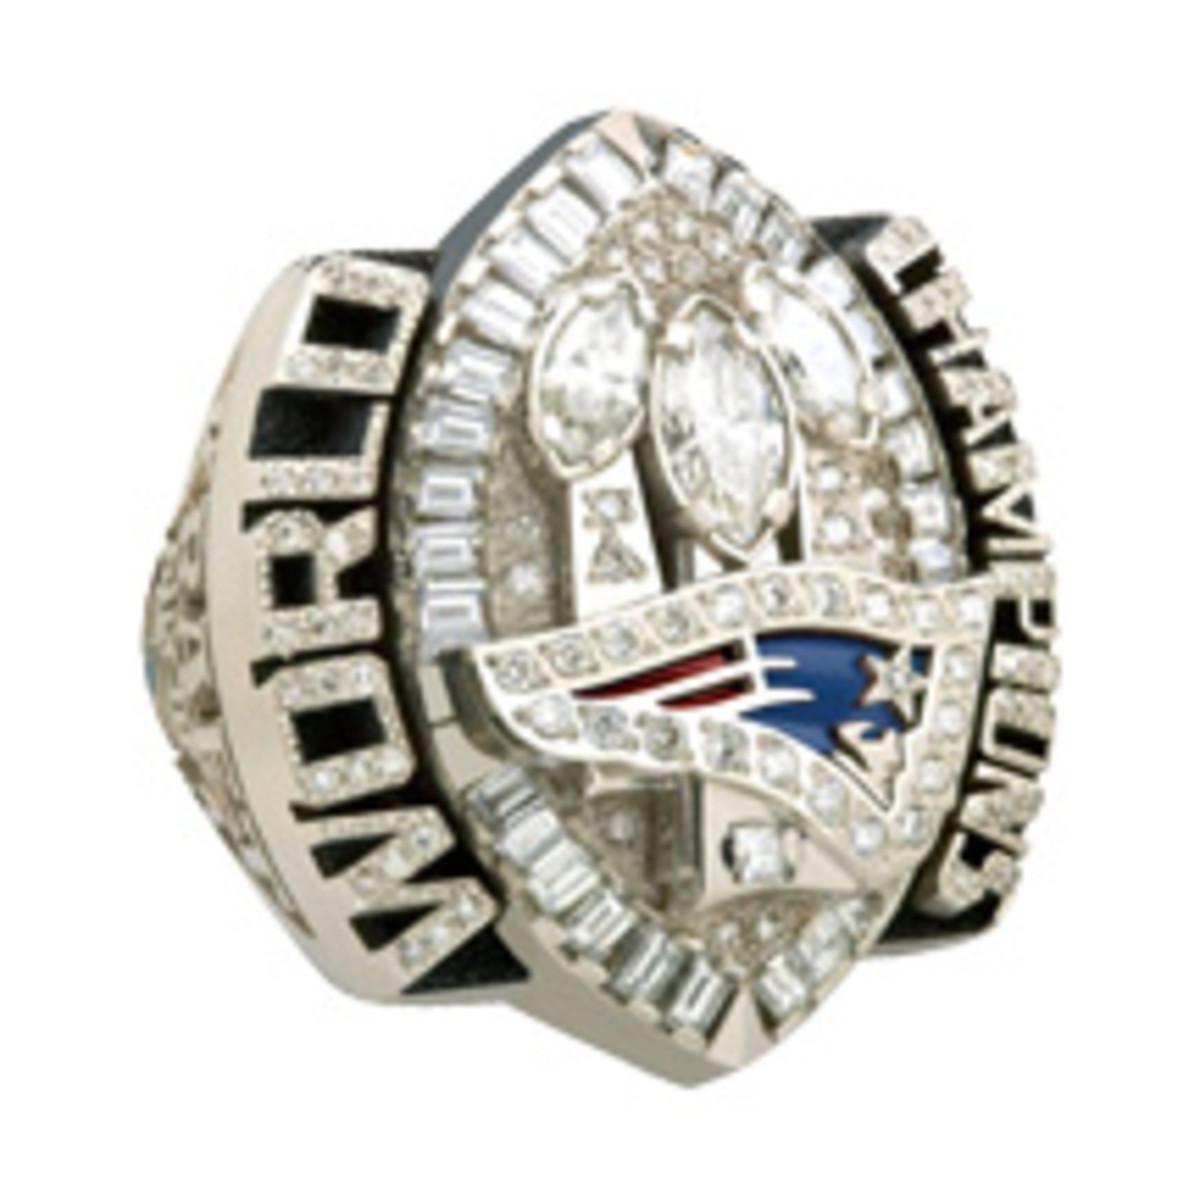 XXXIX New England Patriots 2004